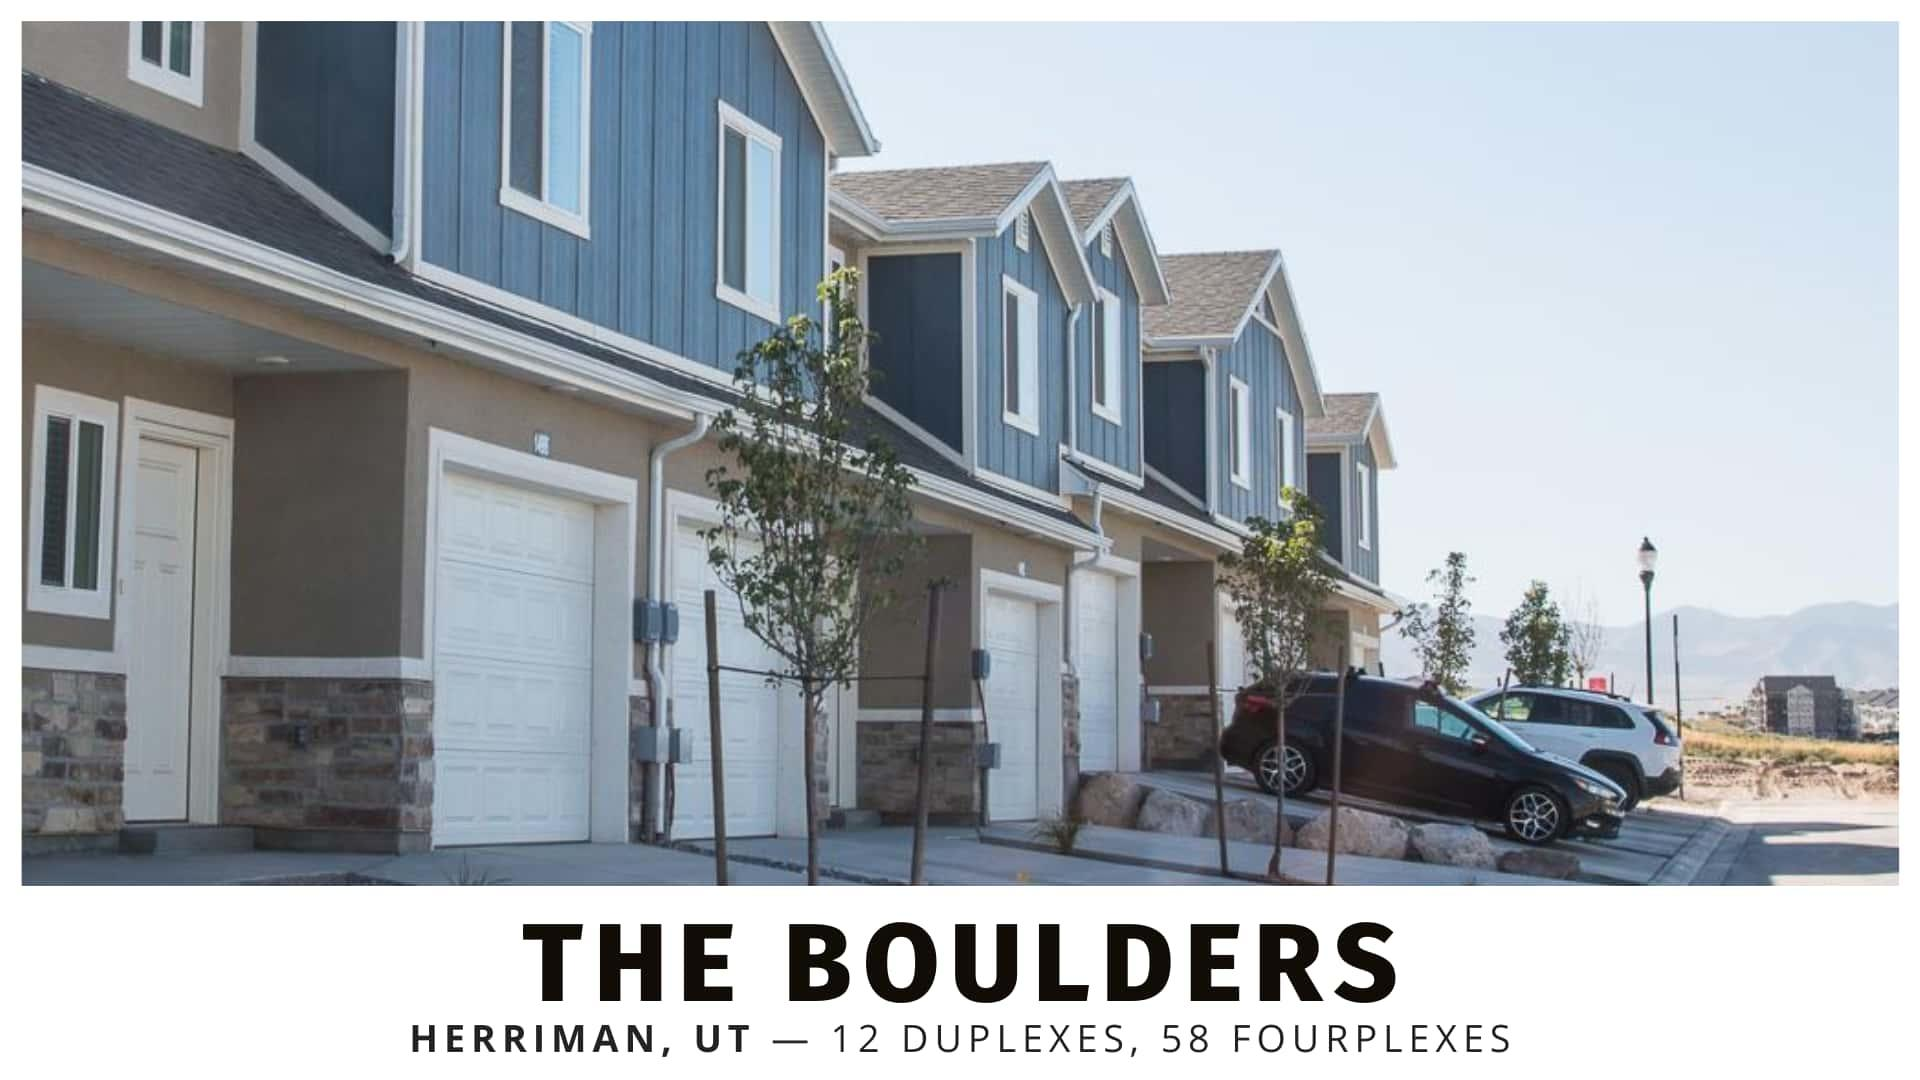 The Boulders duplexes and fourplexes for sale in Herriman, Utah